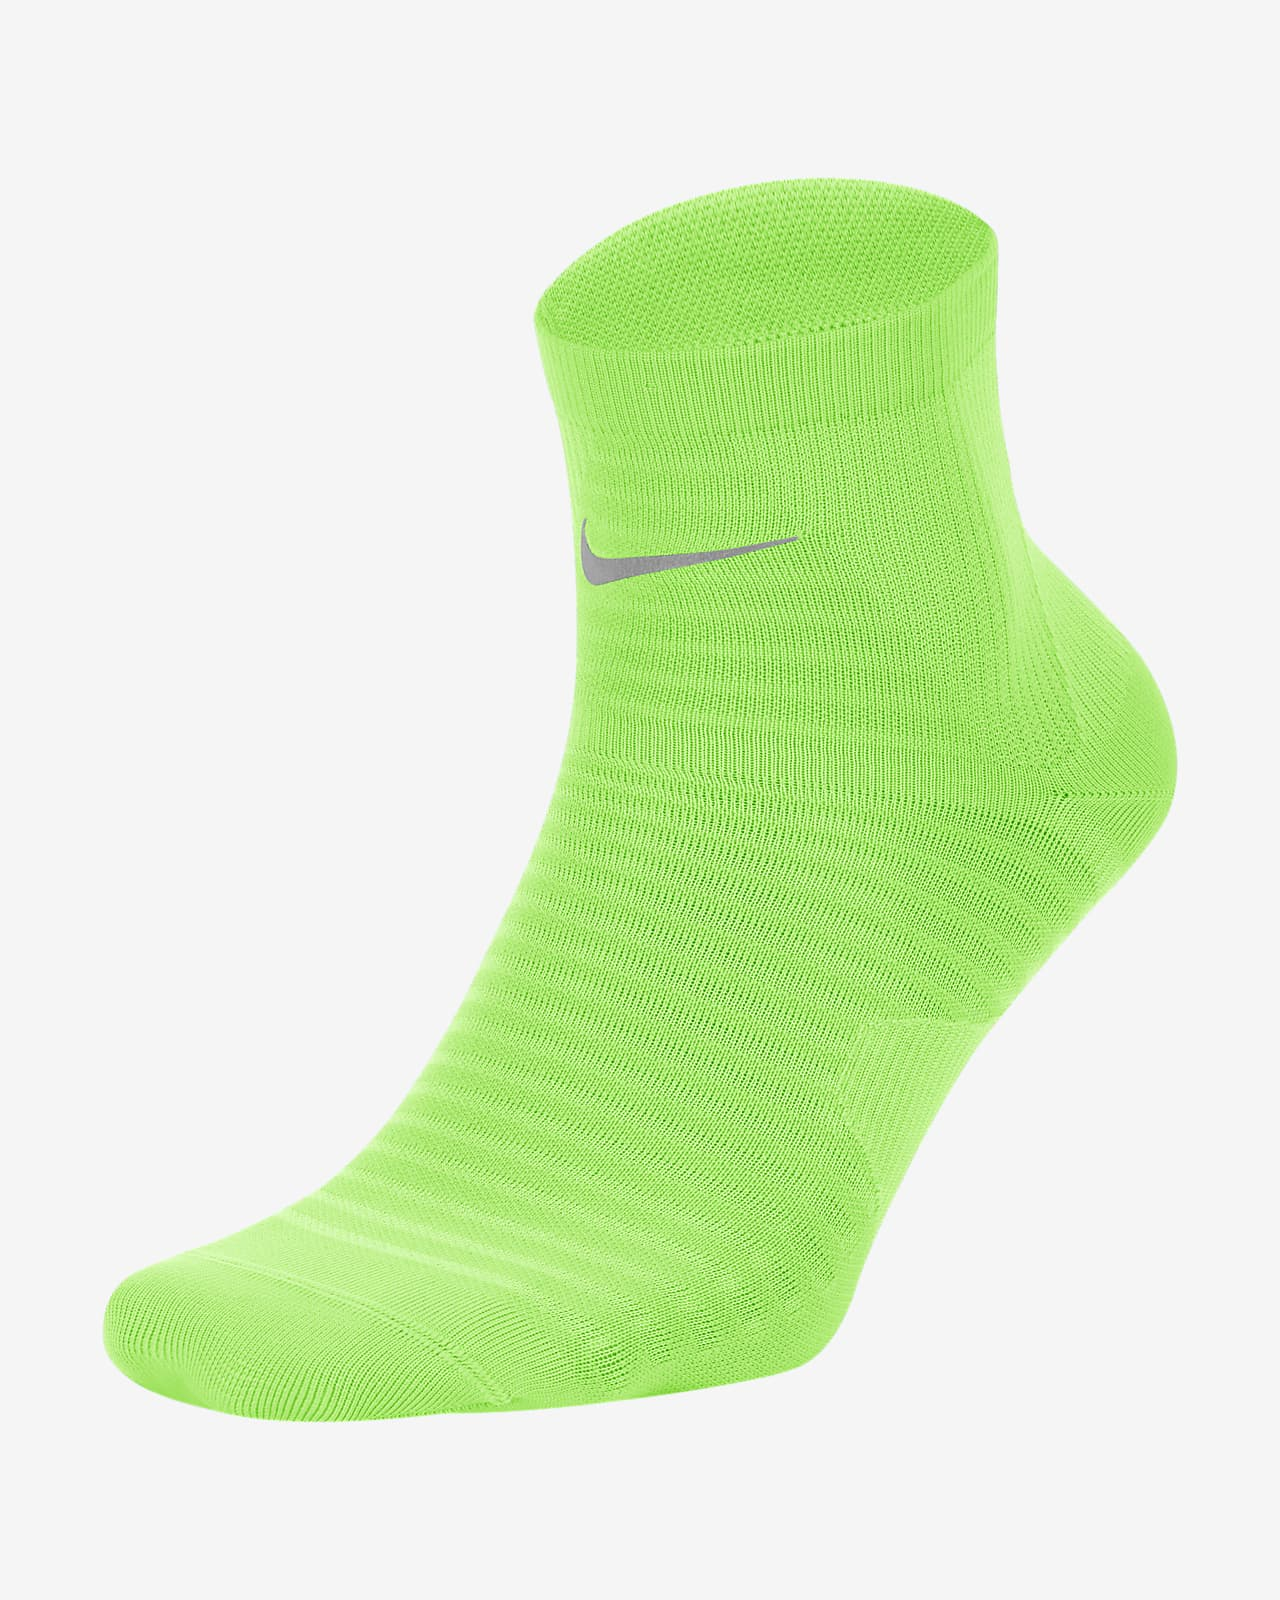 Nike Spark Lightweight Enkelsokken voor hardlopen